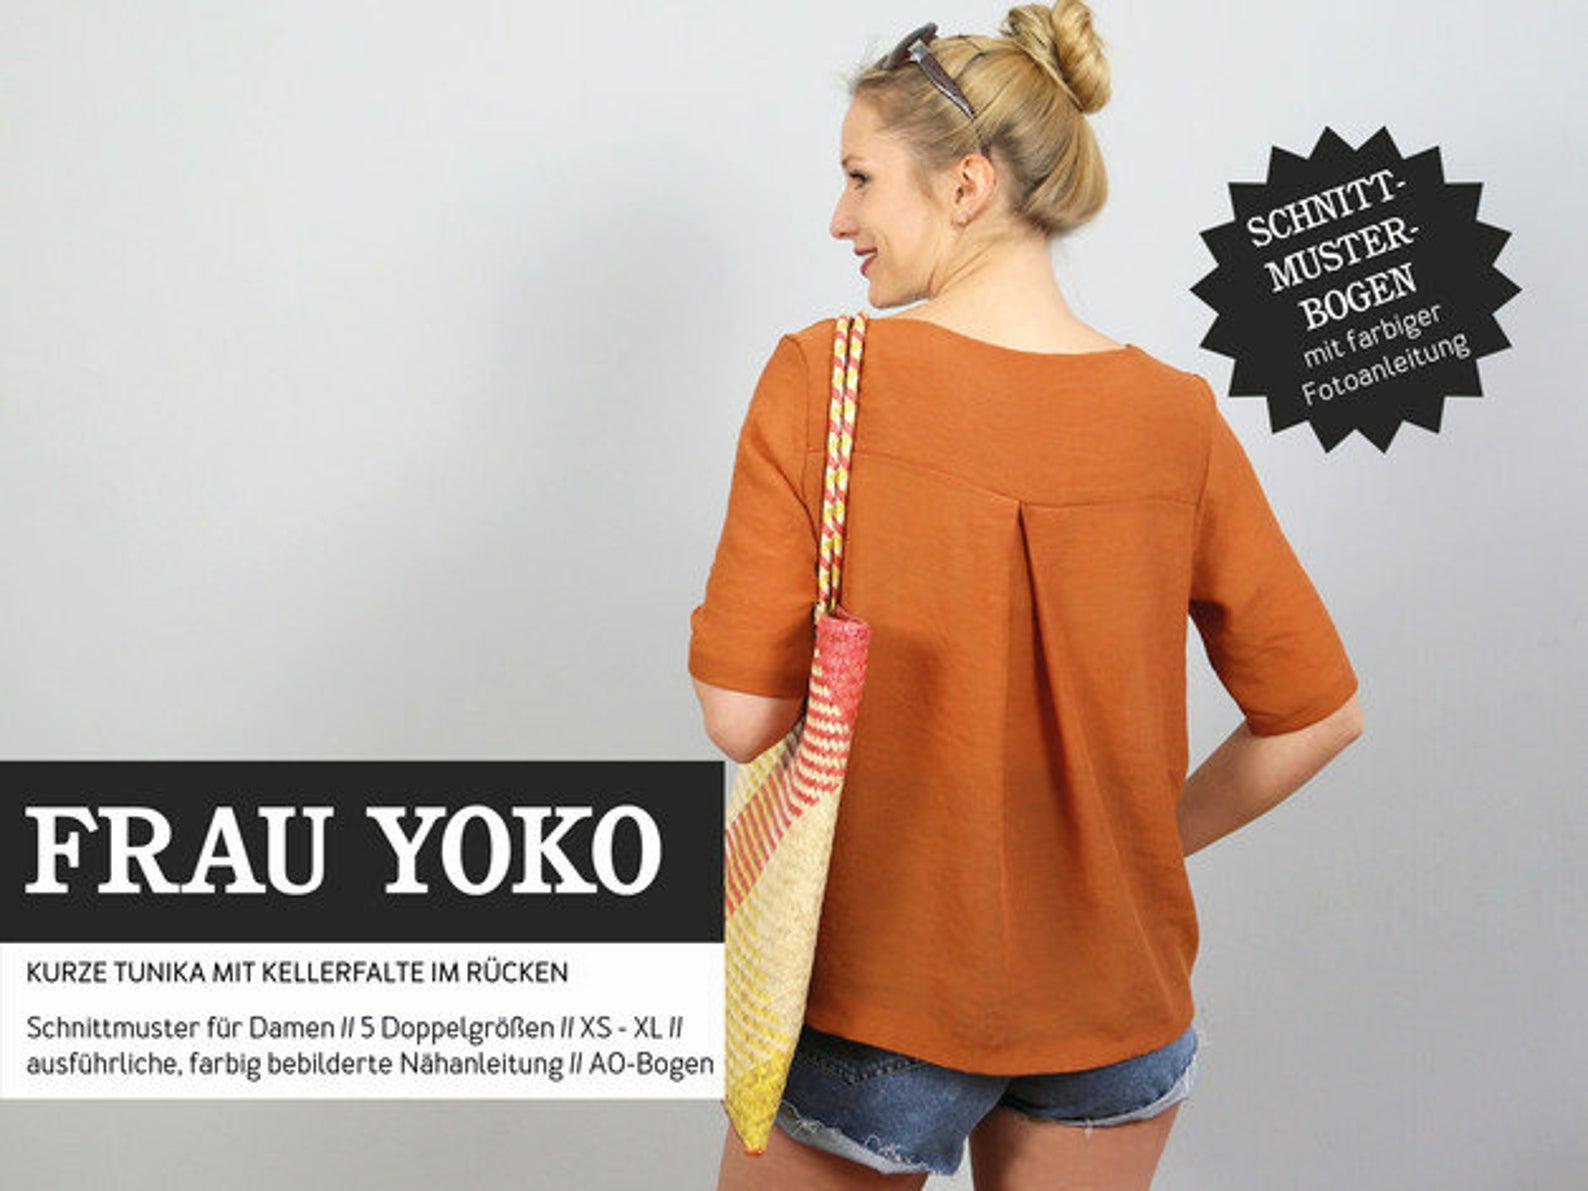 STUDIO SCHNITTREIF Frau Yoko Tunika Bluse Papierschnittmuster